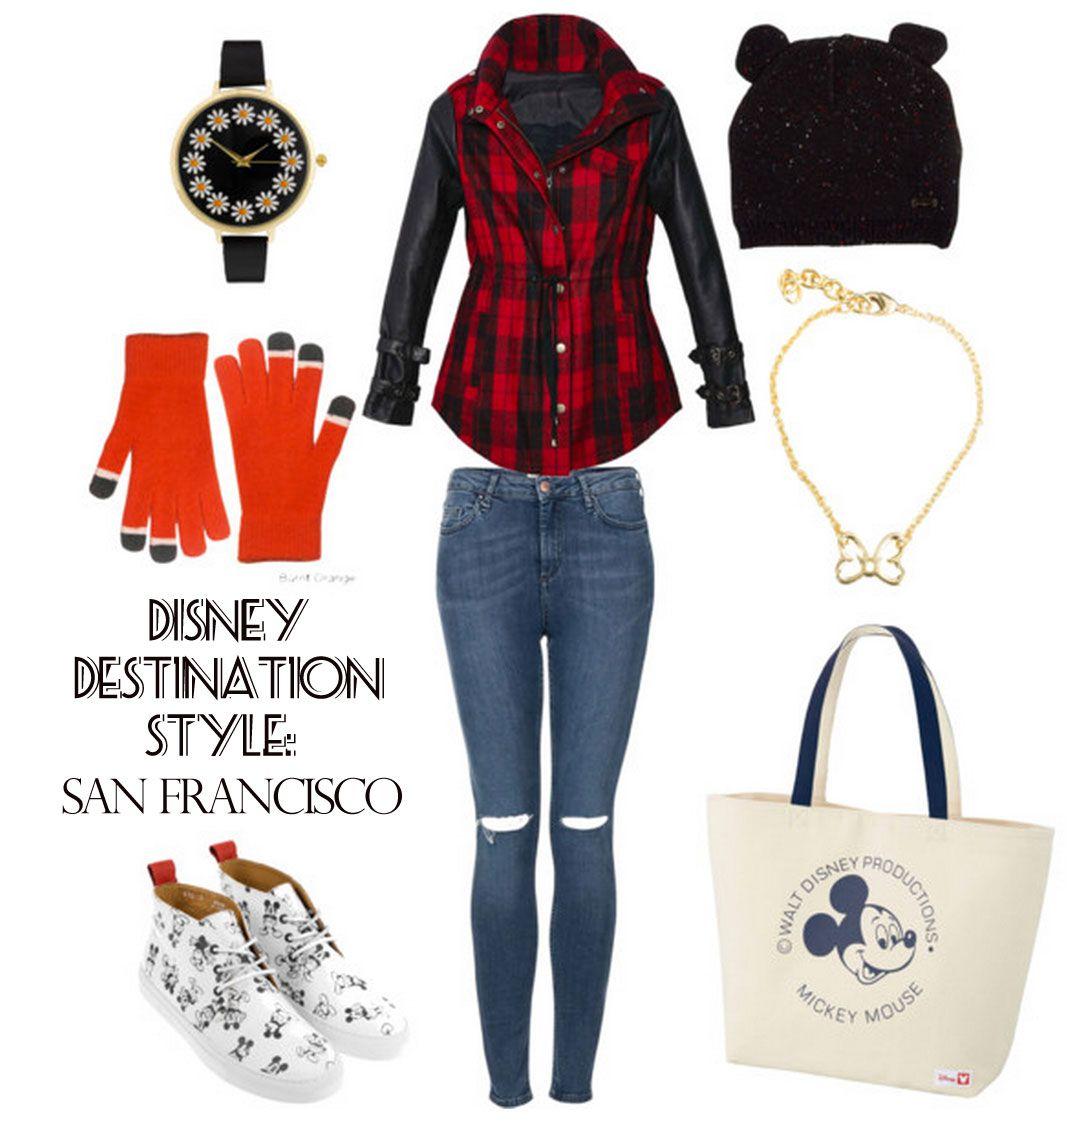 Disney Destination Style: San Francisco